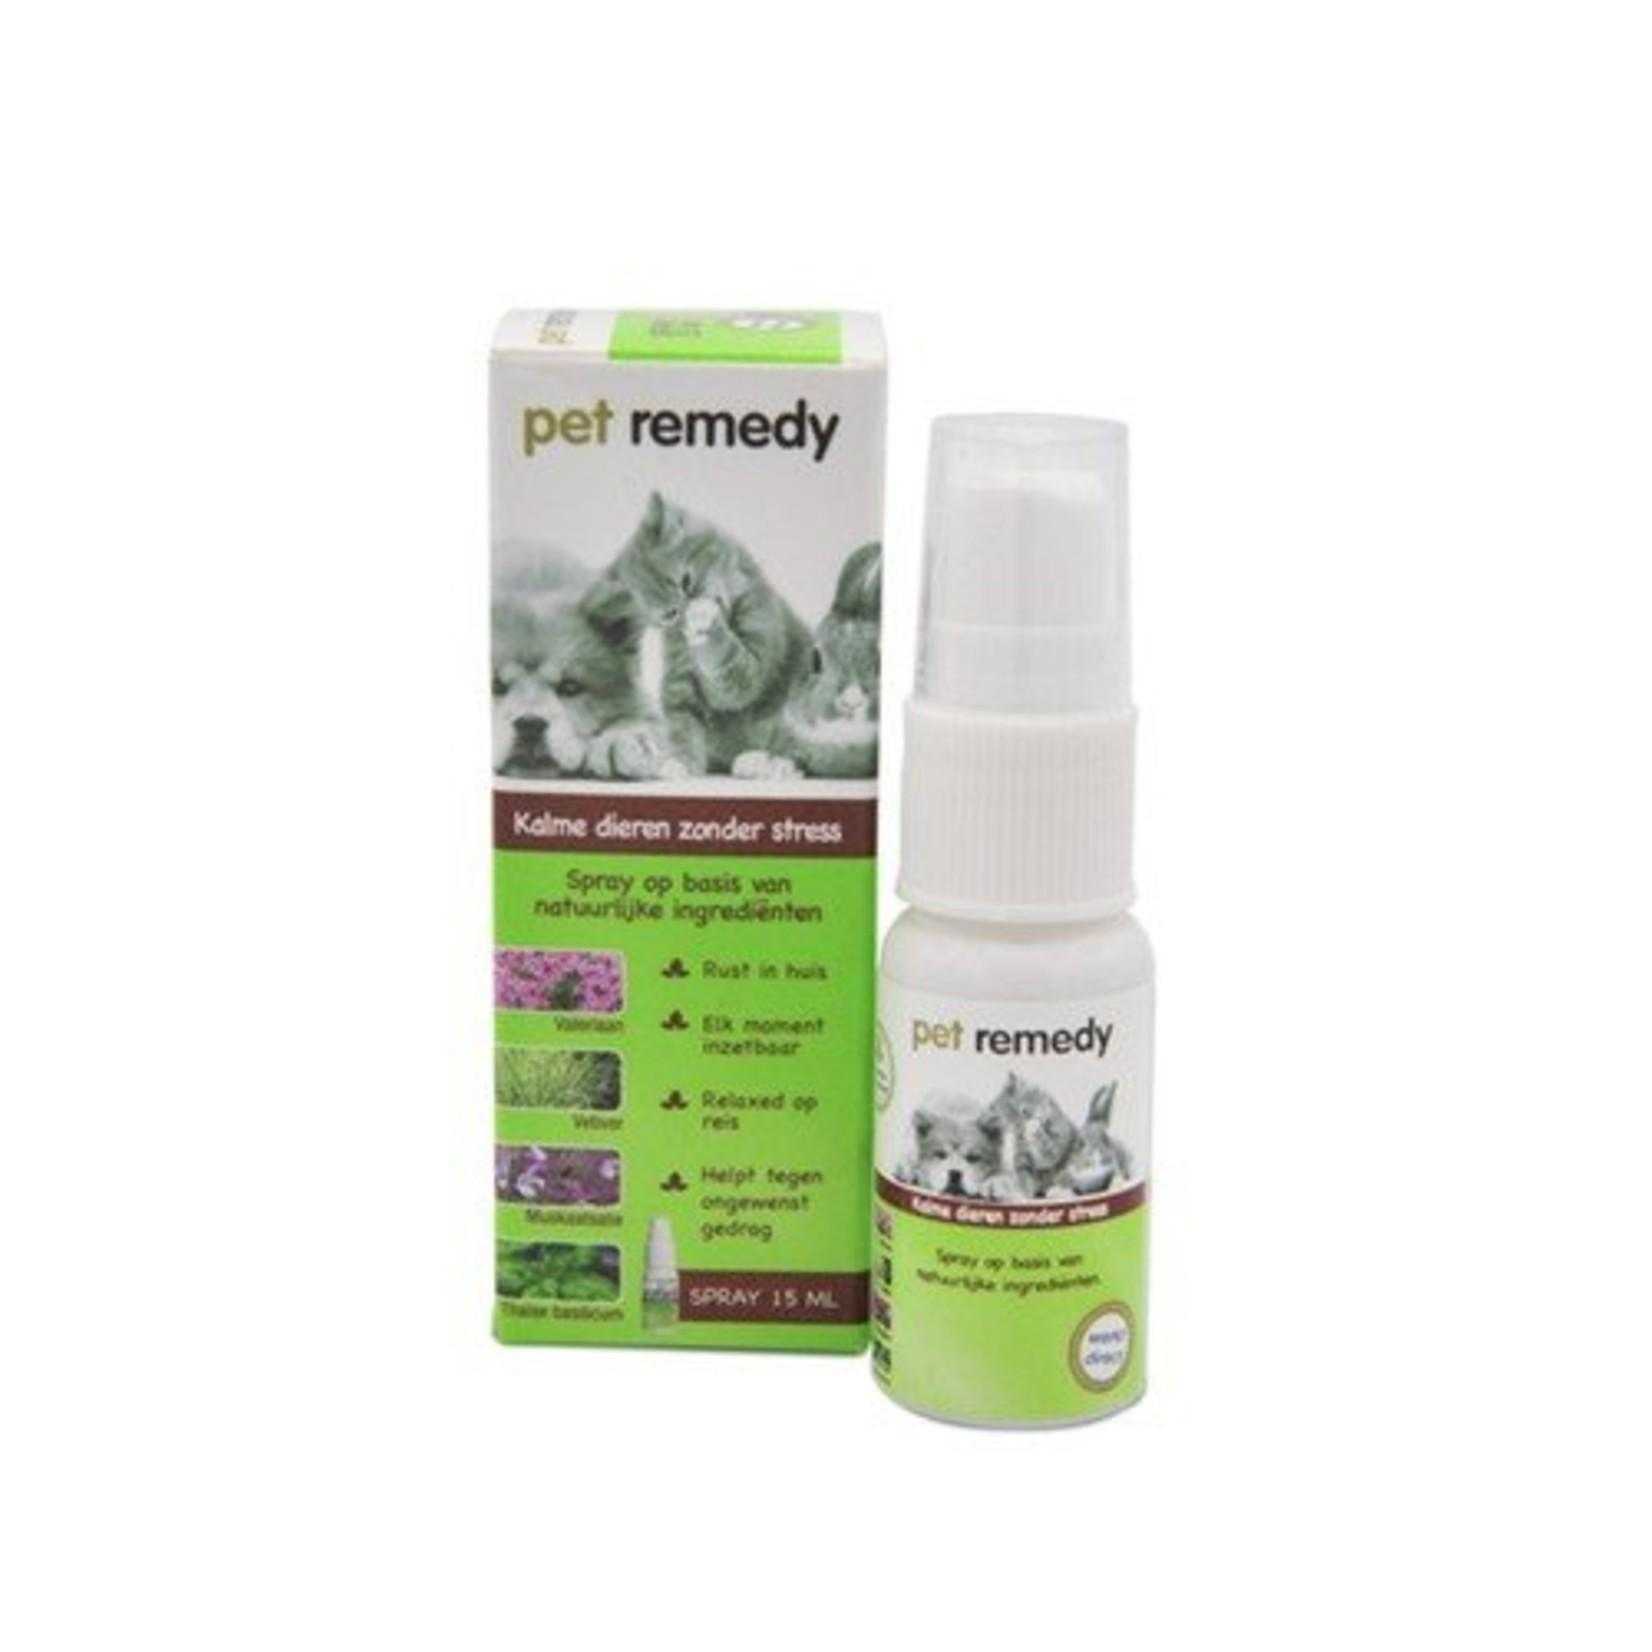 Pet Remedy, No Stress spray 15 ml